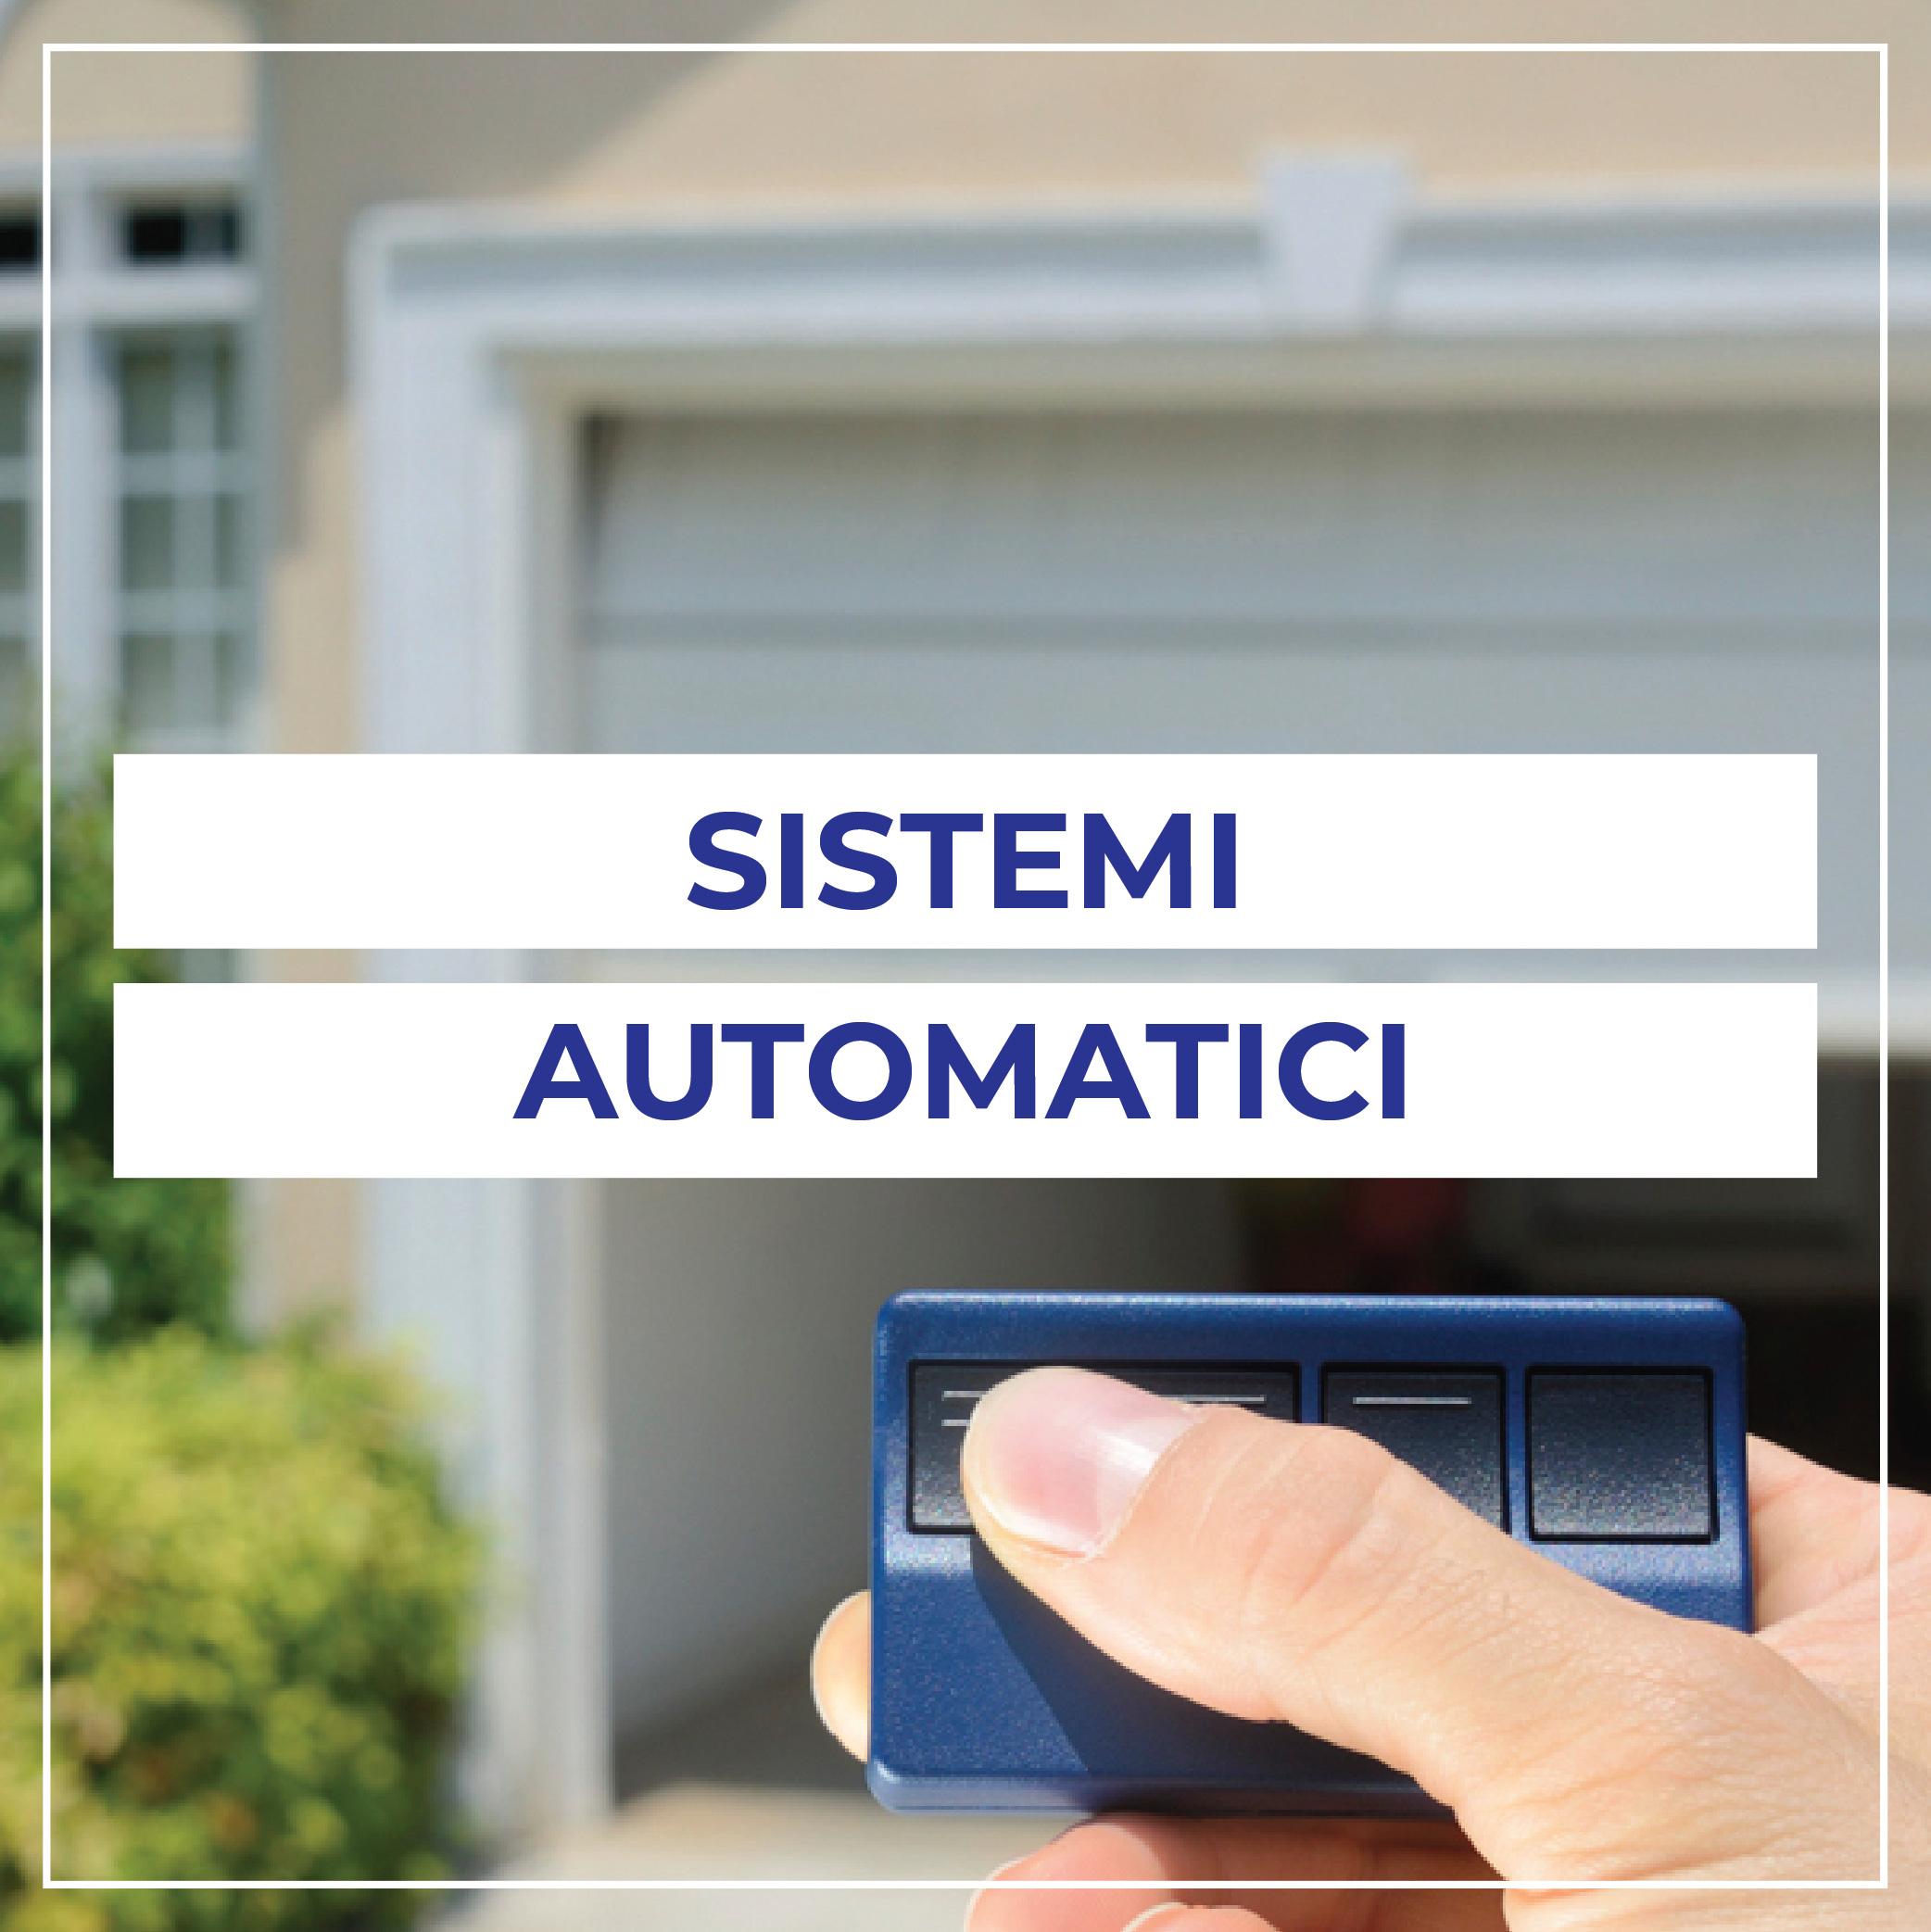 Servizi sirp impianti elettrici automatismi